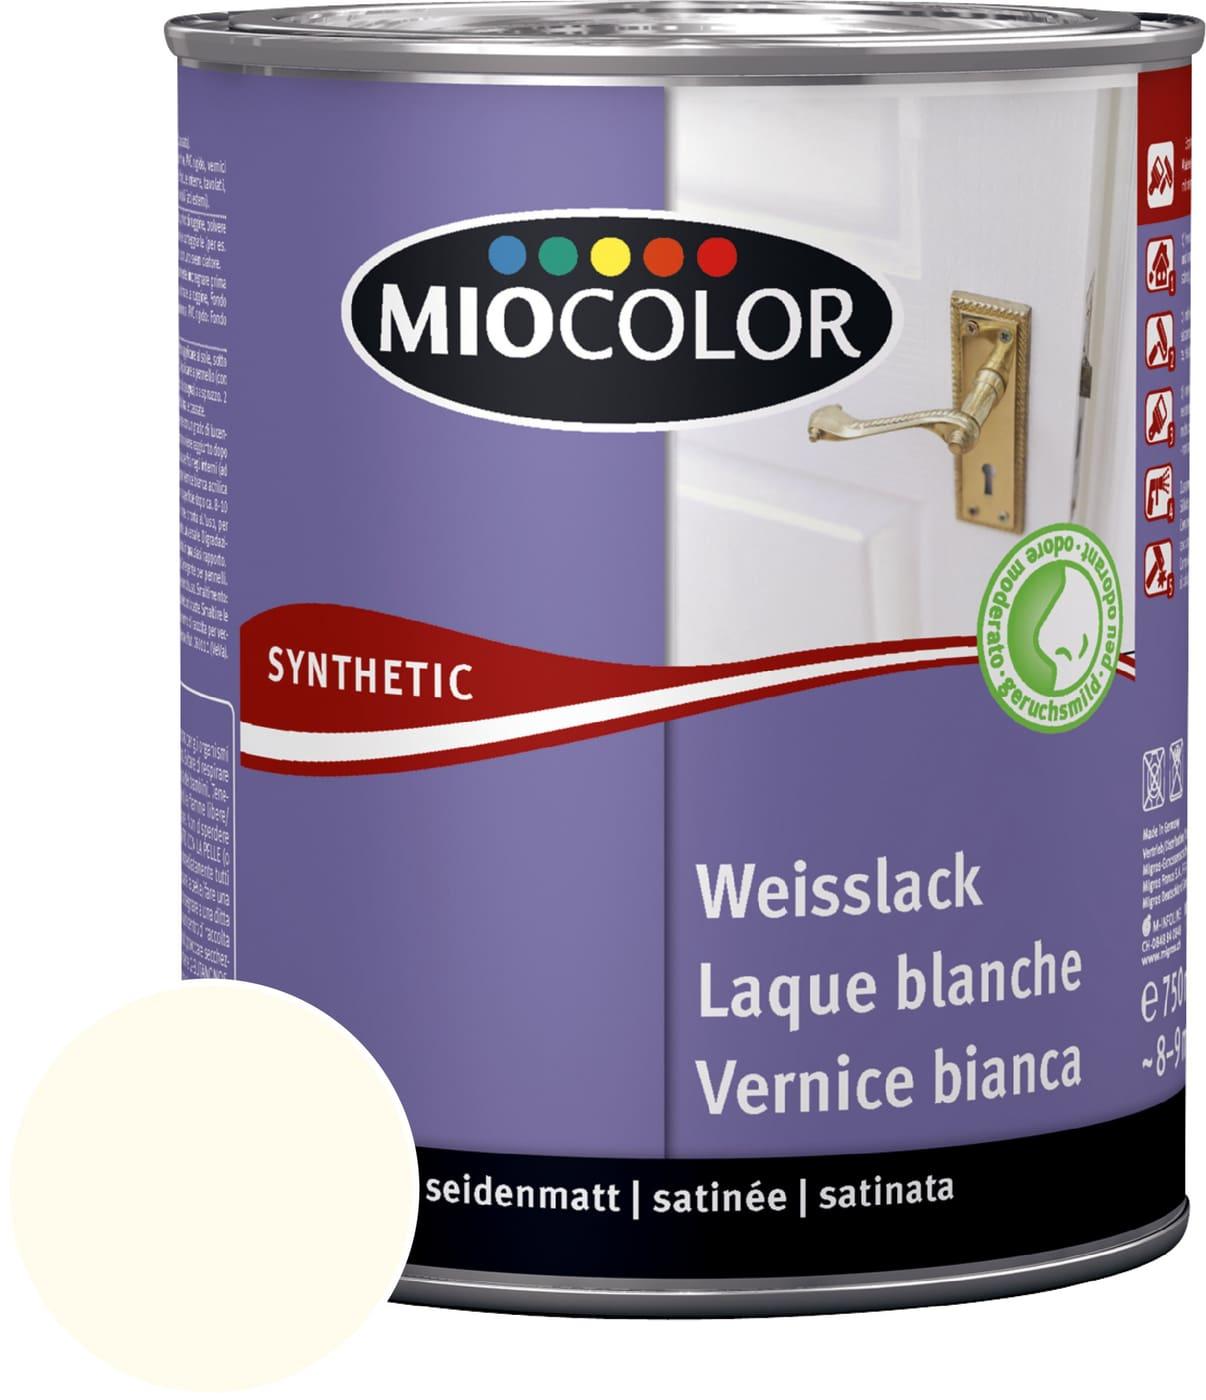 Pittura Resistente Ai Graffi miocolor vernice sintetica bianca satinata opaca bianco vecchio 750 ml